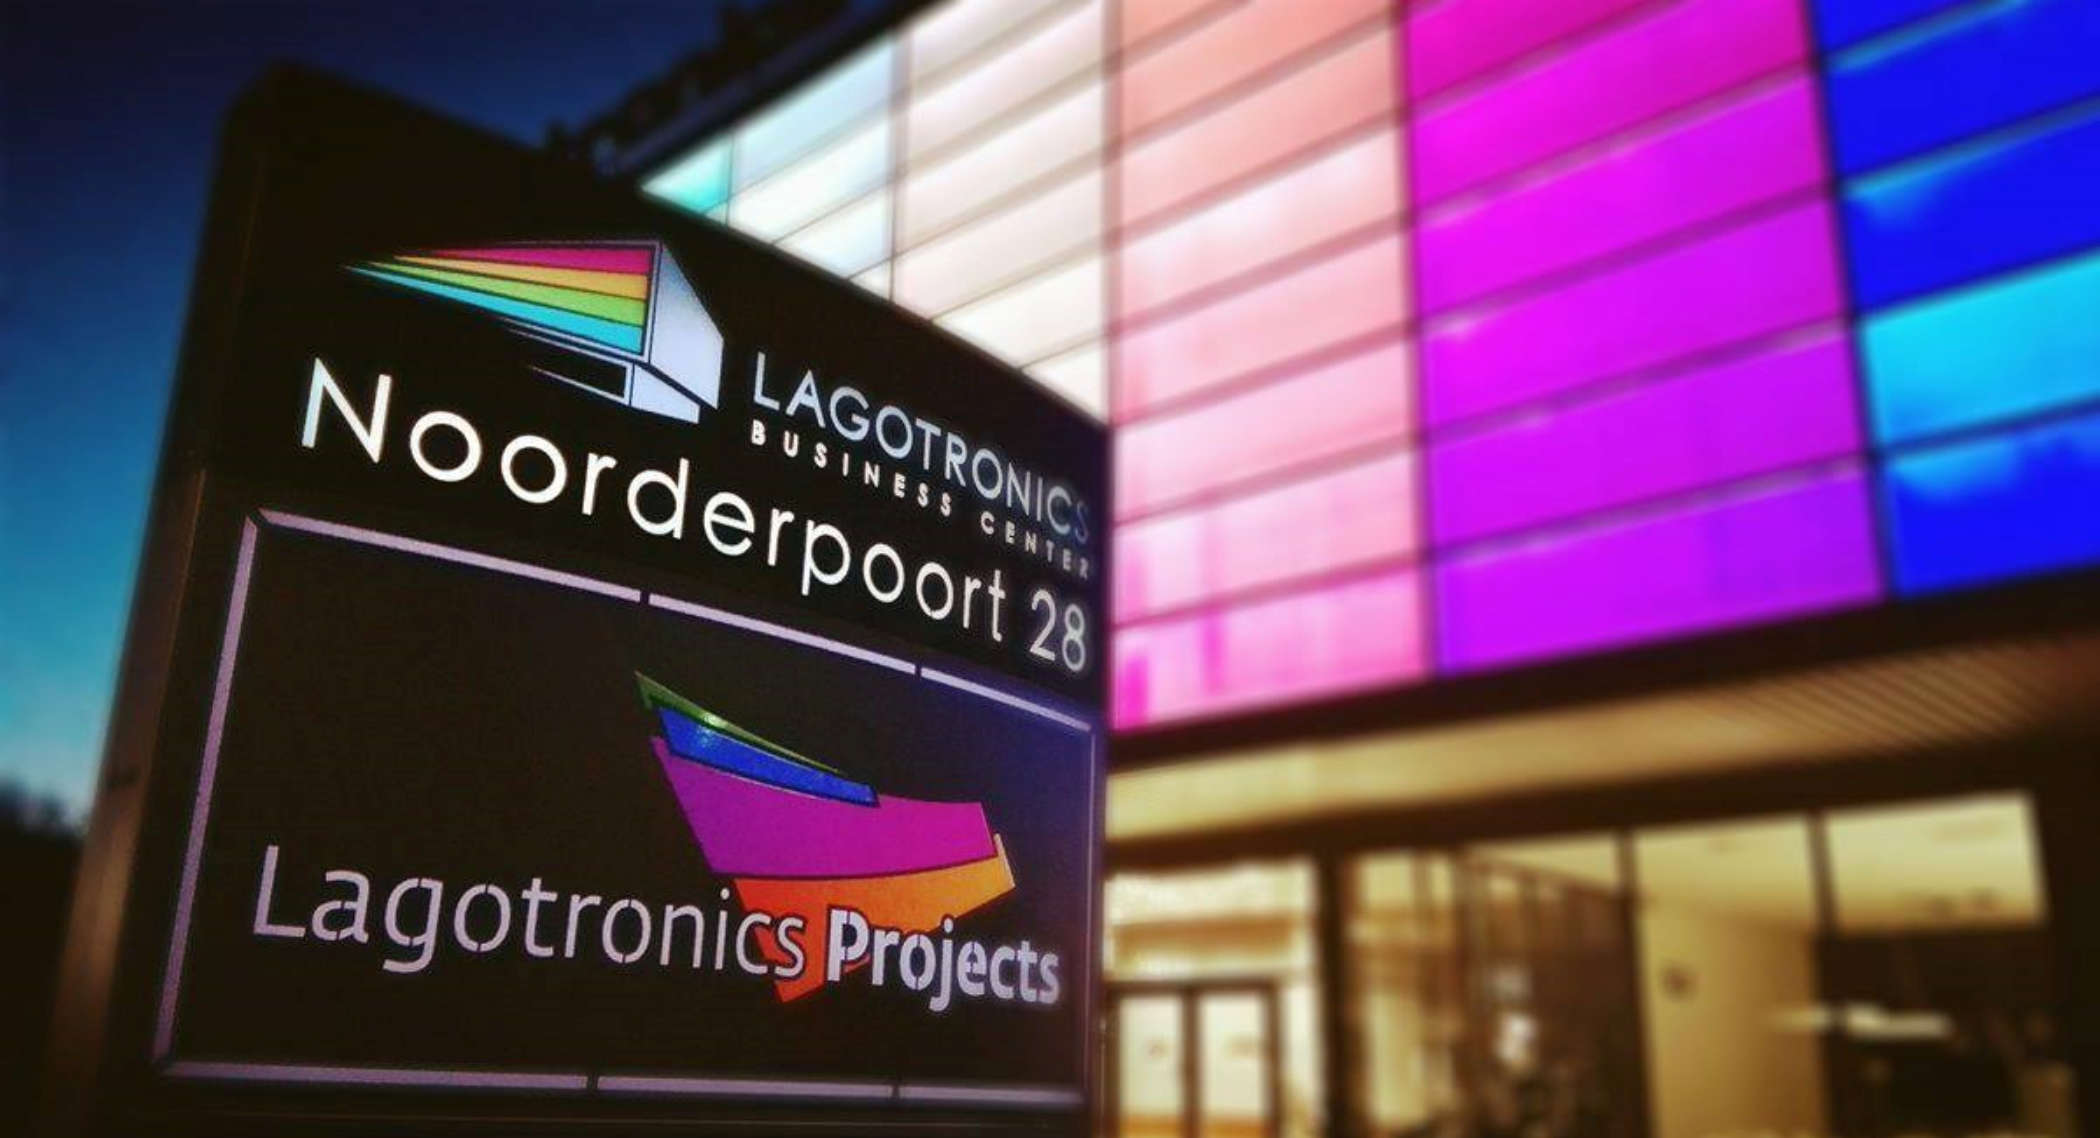 Lagotronics Projects Eigen Sterk Merk